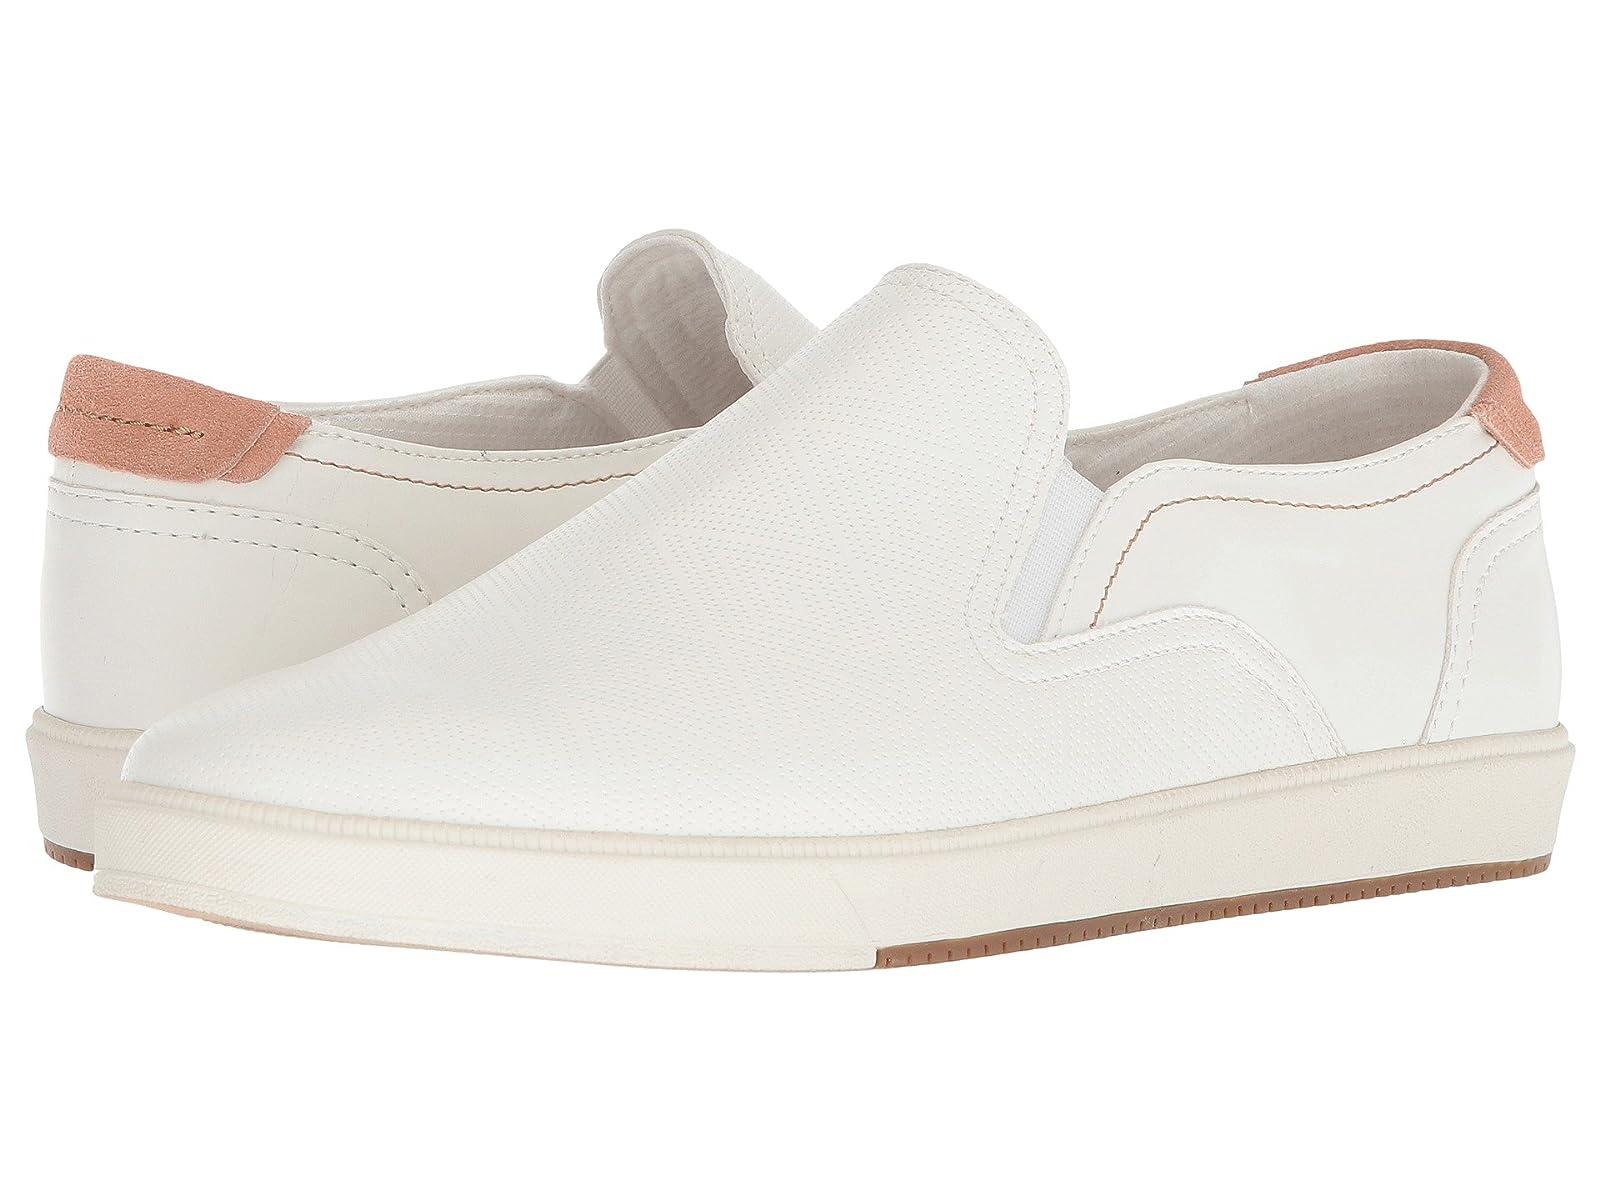 ALDO OlevanoAtmospheric grades have affordable shoes